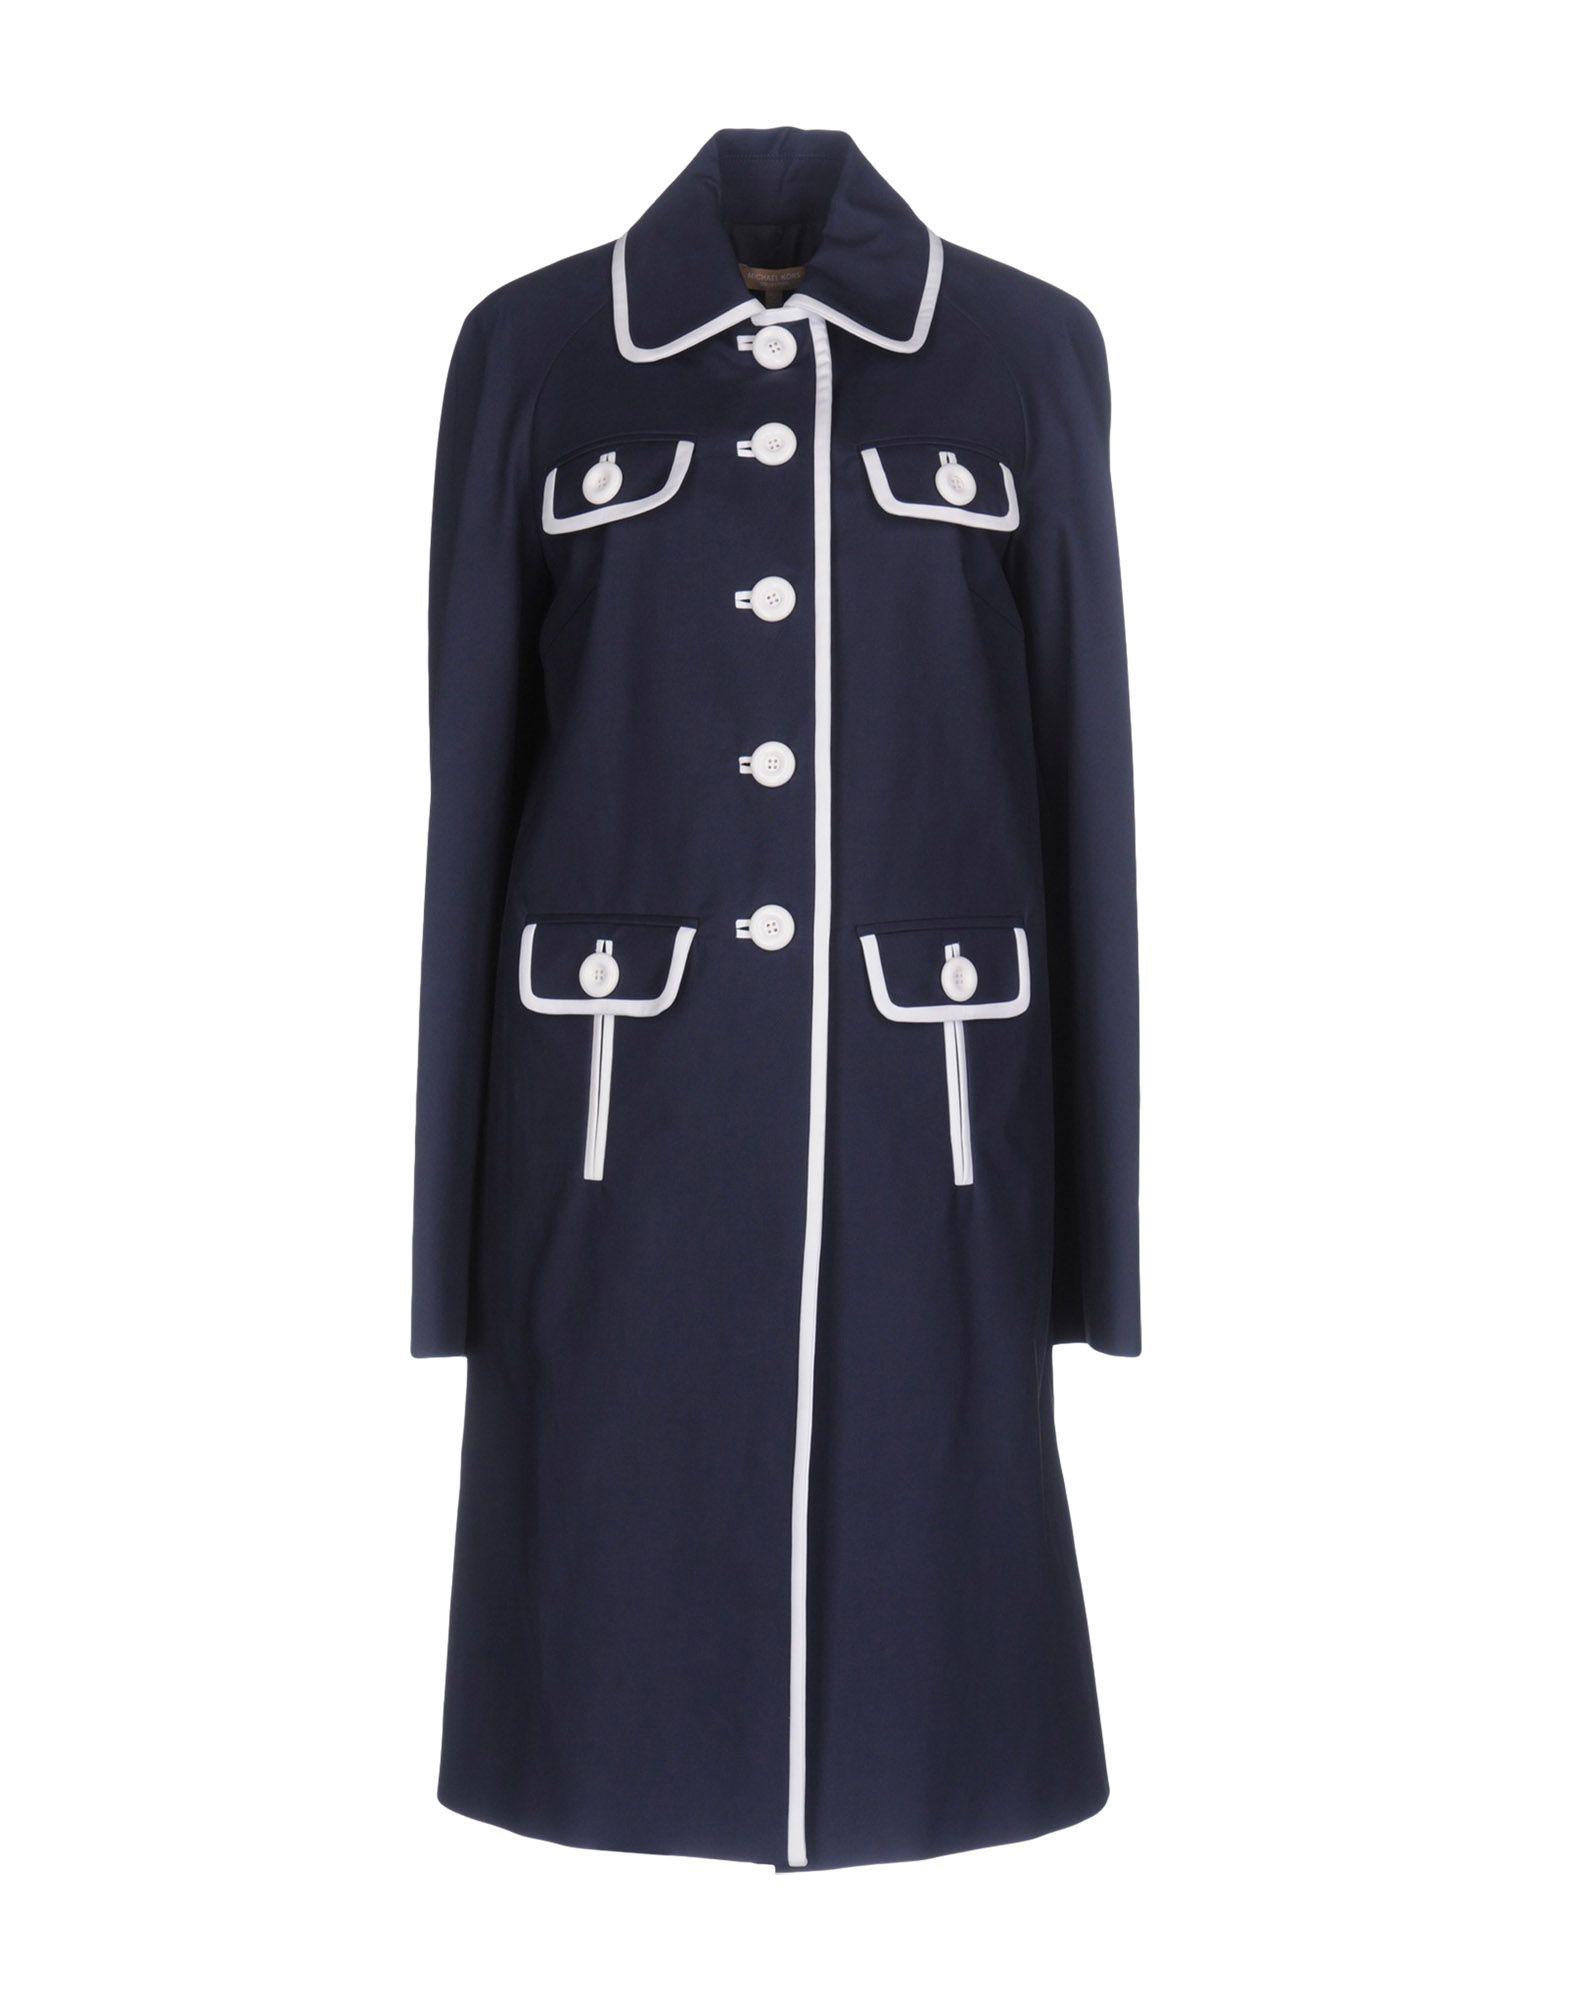 MICHAEL KORS COLLECTION Легкое пальто michael kors collection пальто